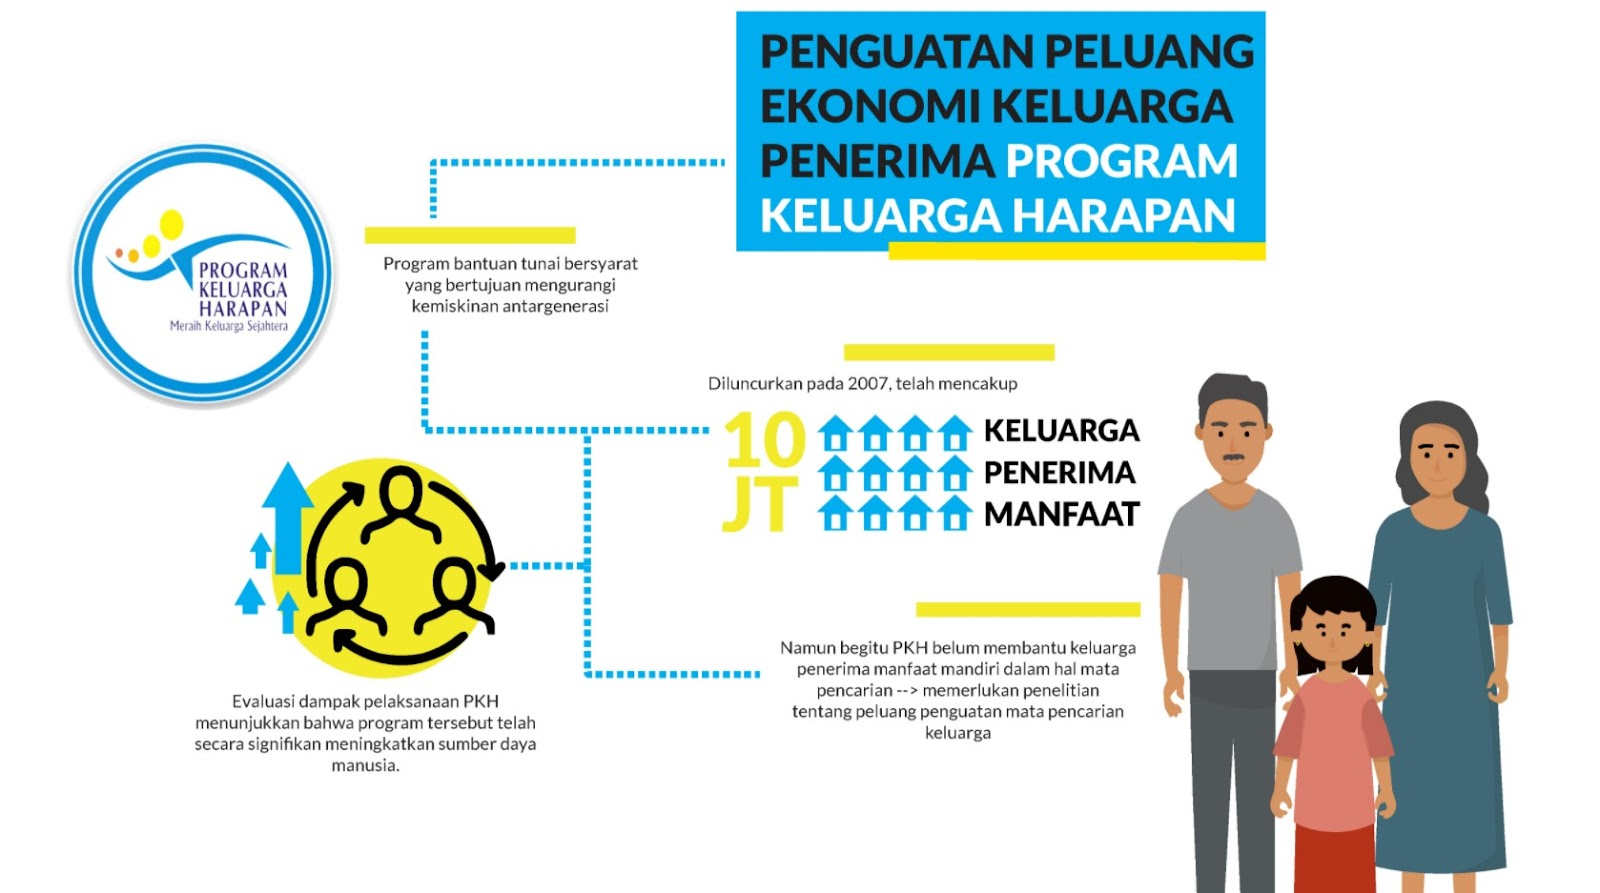 Penguatan ekonomi keluarga lewat Program Keluarga Harapan